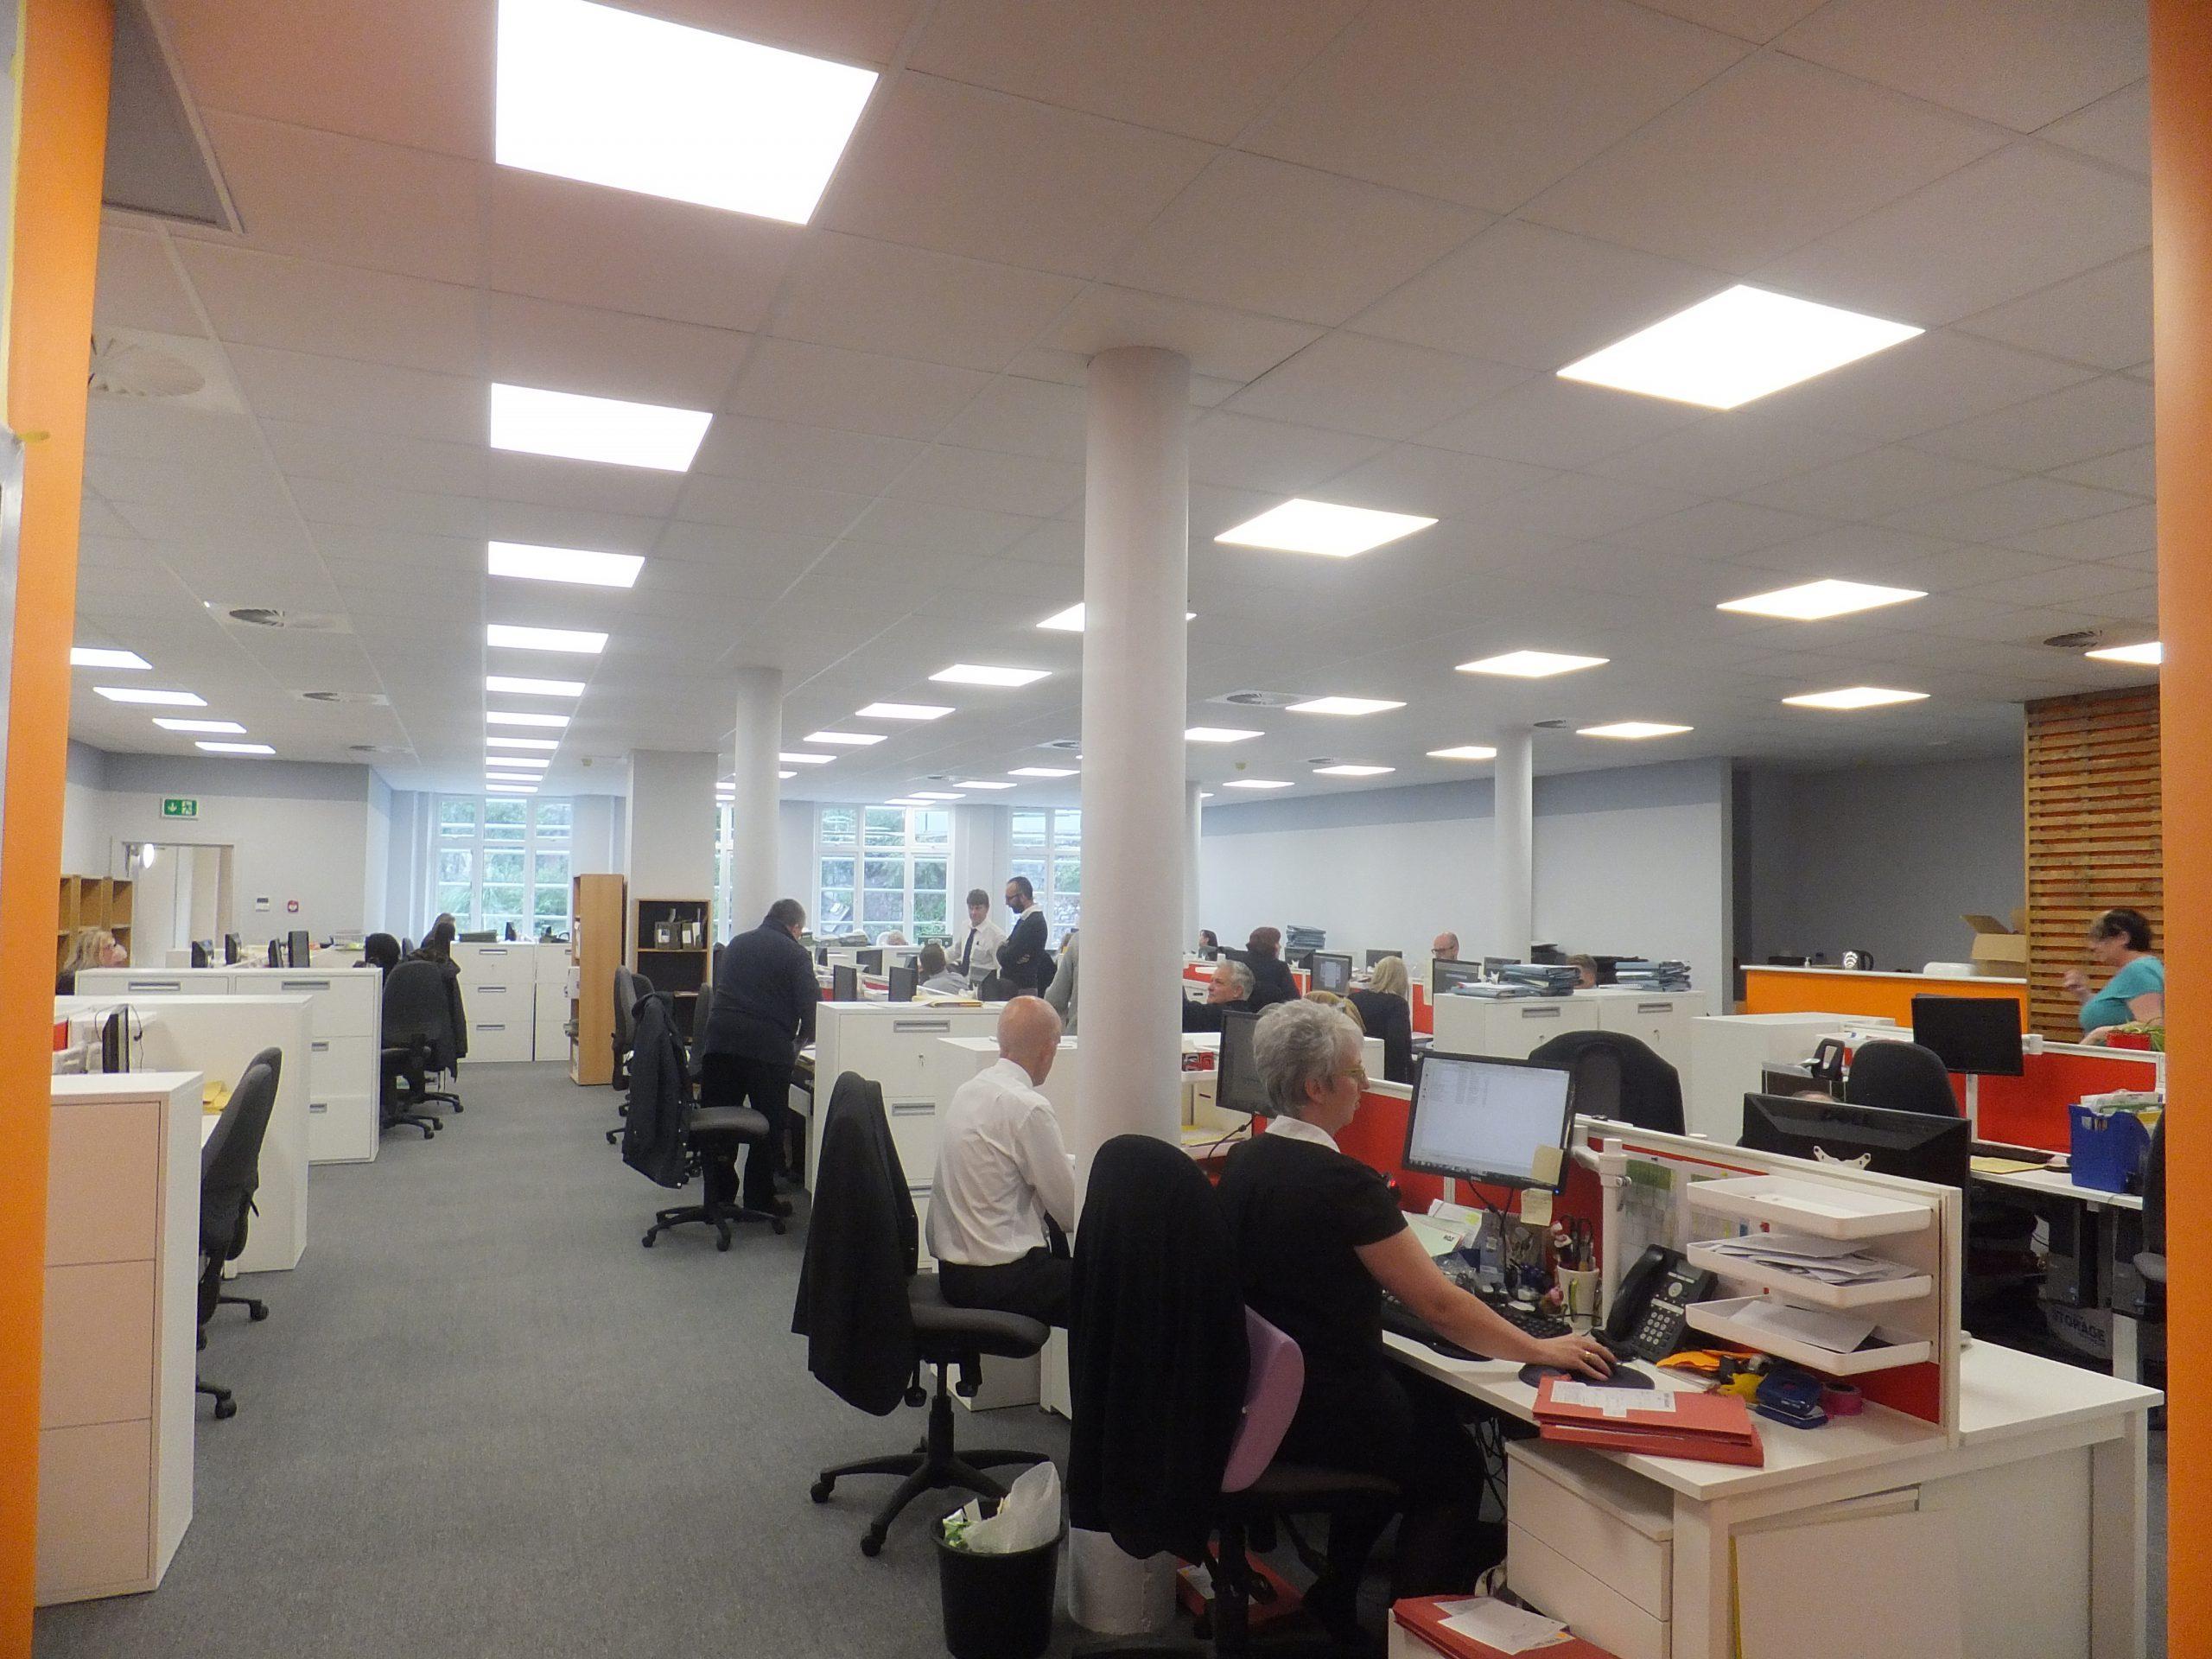 Solicitors Offices, Torquay, Devon